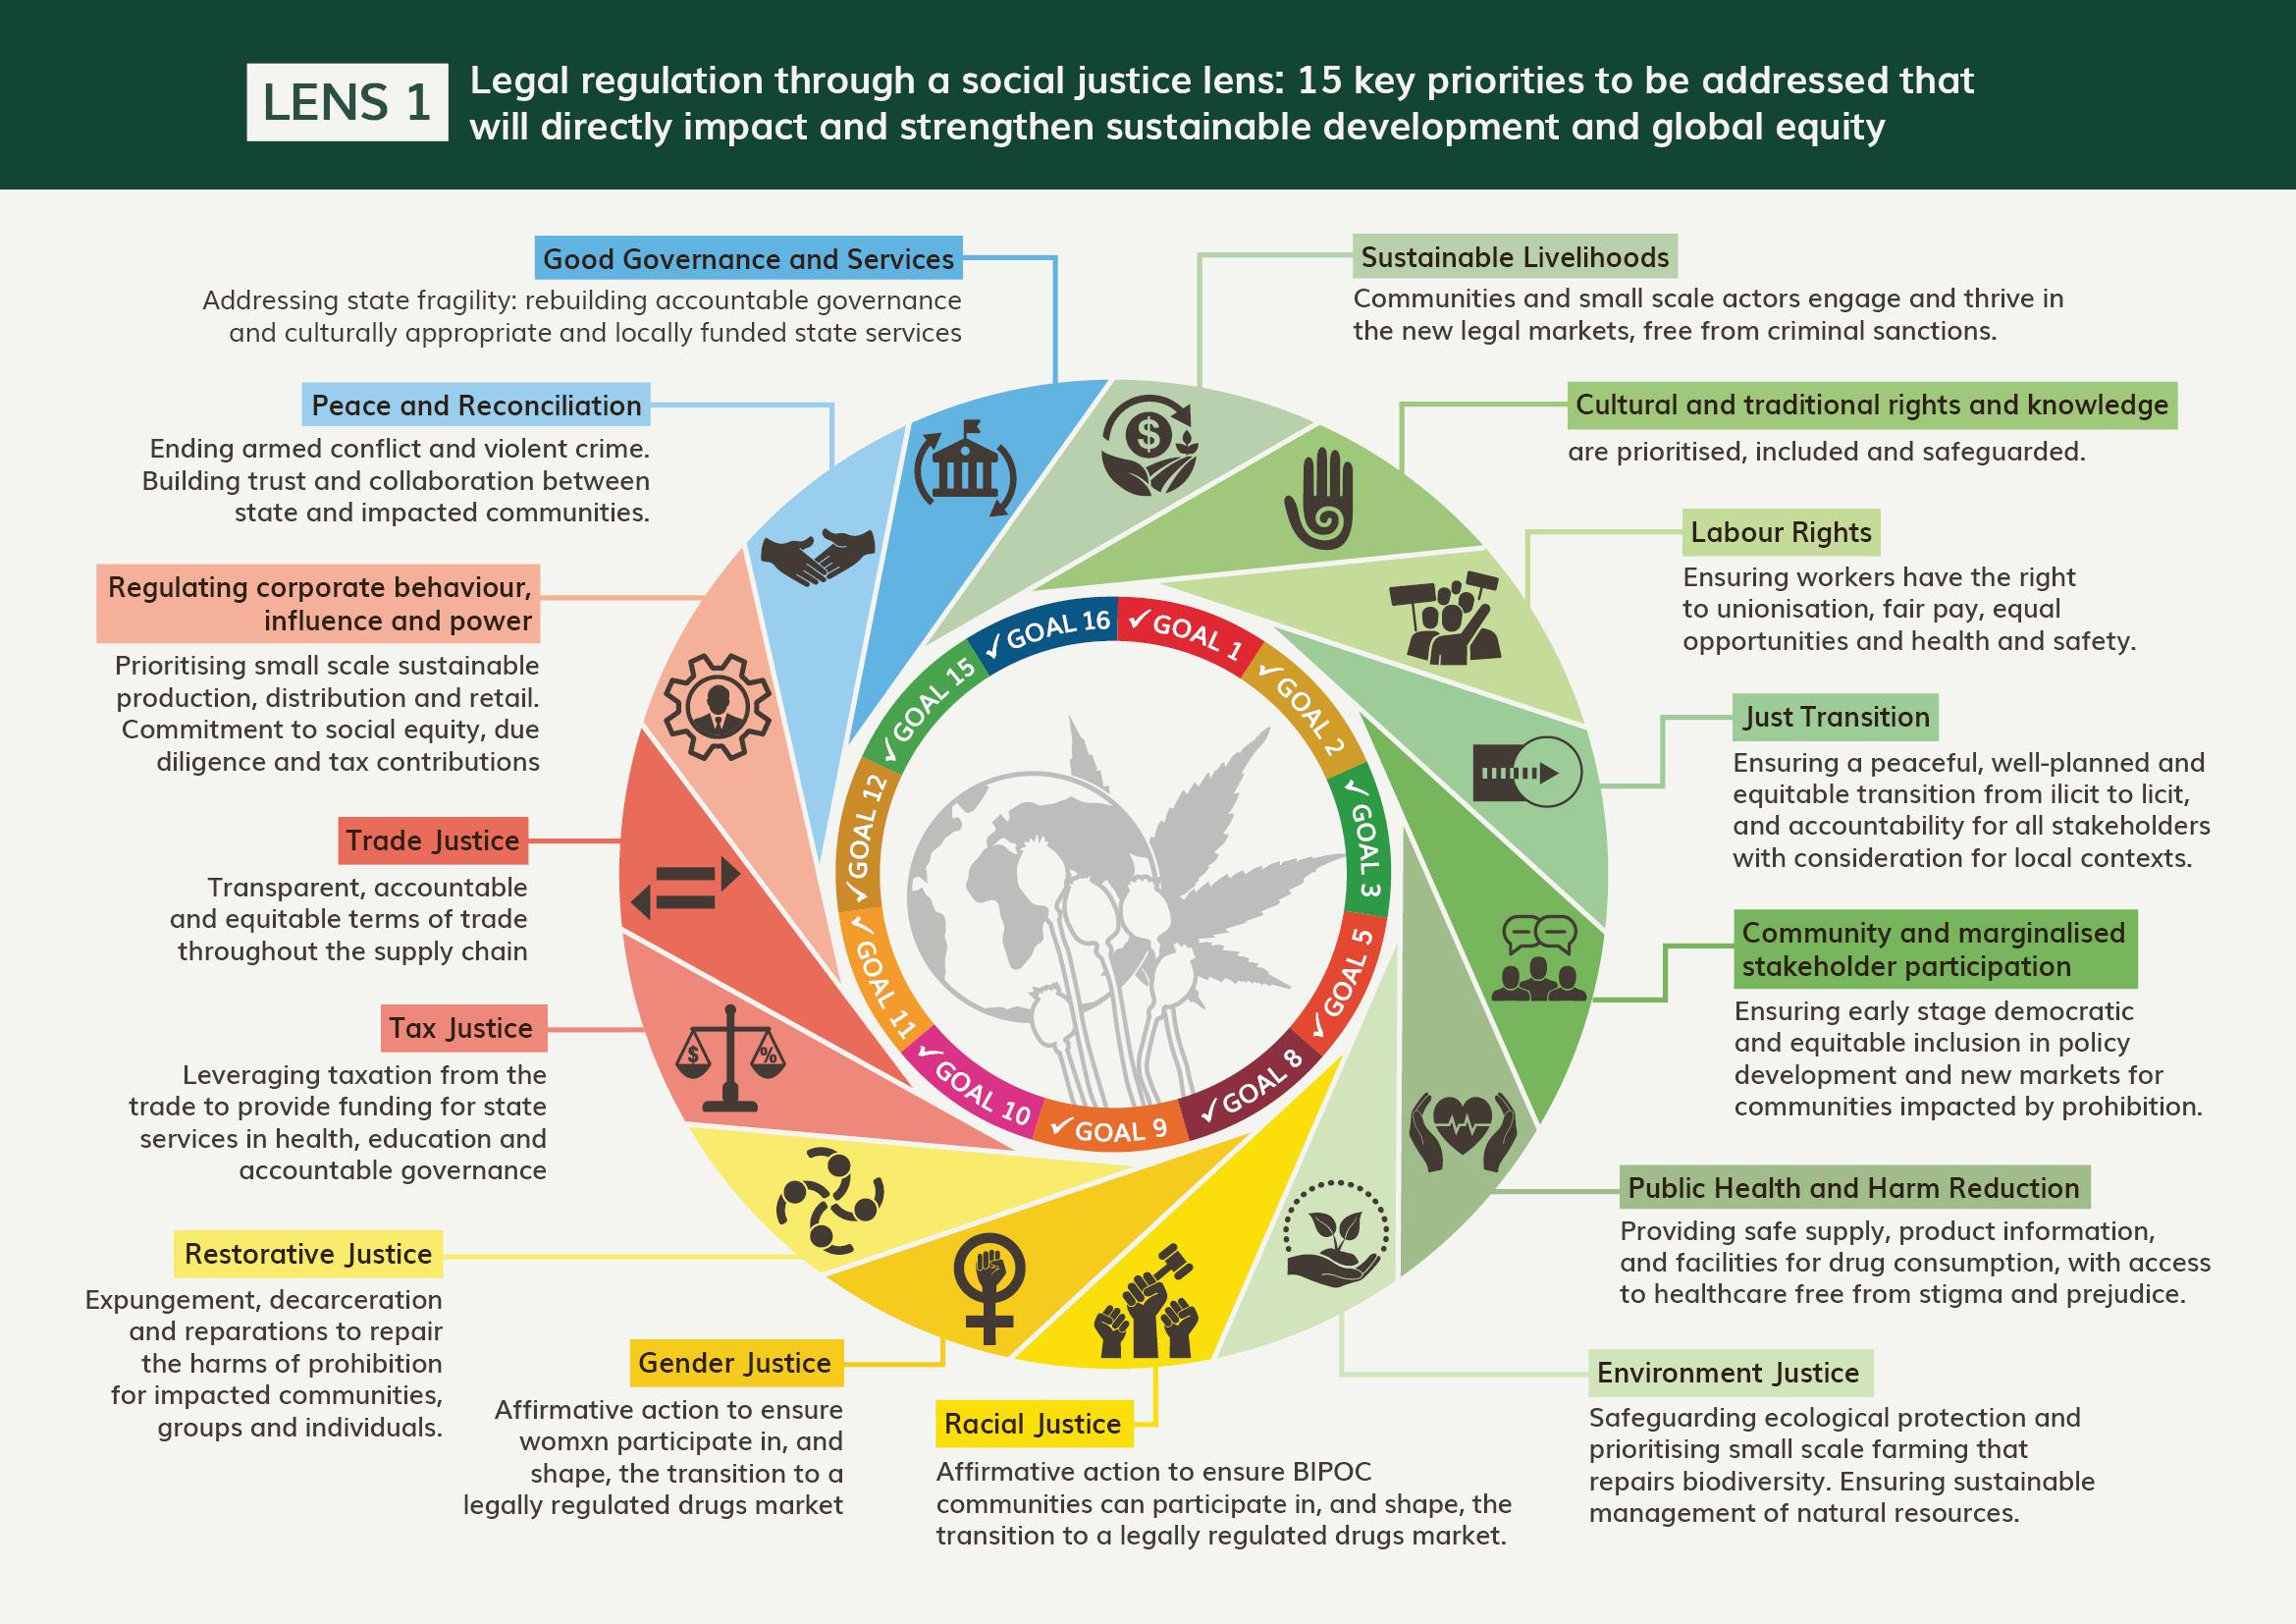 Legal Regulation of Drugs through a Social Justice Lens